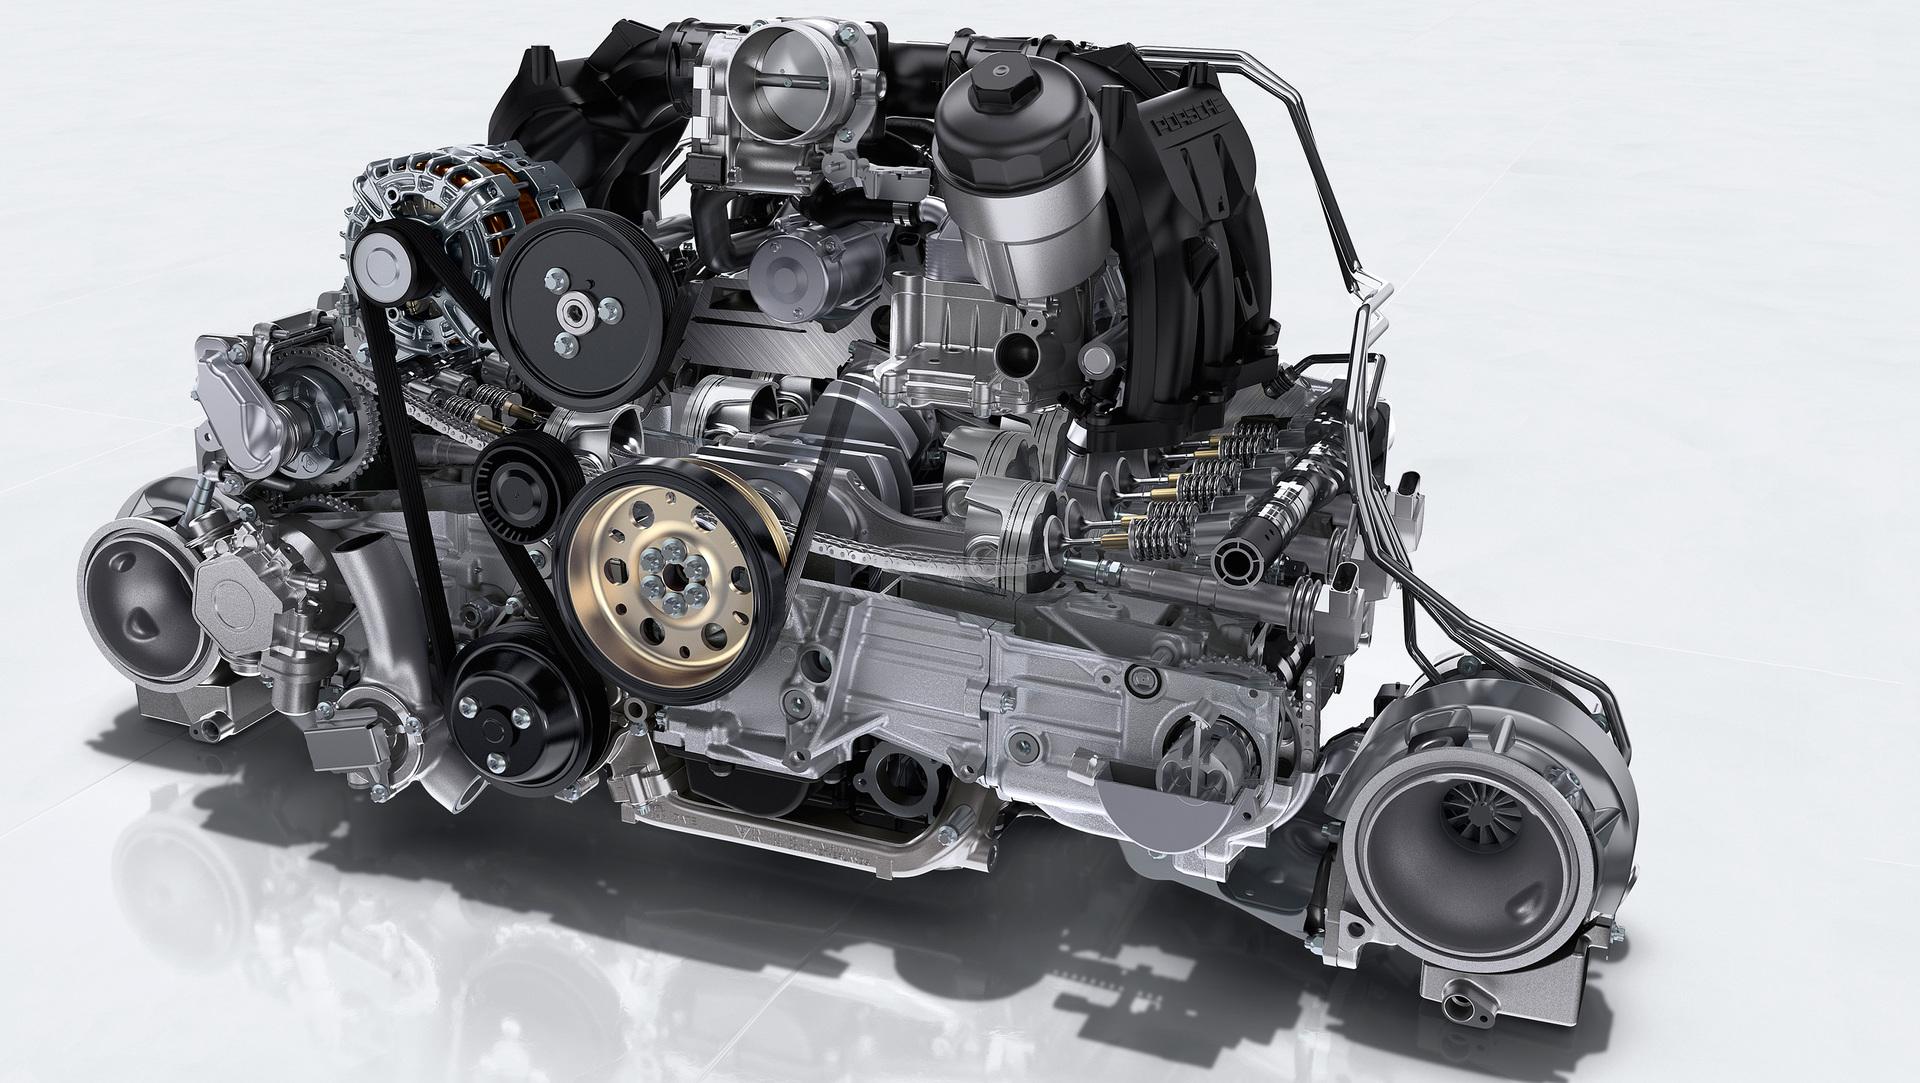 911 Gt2 Rs 3 8 Litre Six Cylinder Twin Turbo Boxer Engine 2017 Porsche Ag